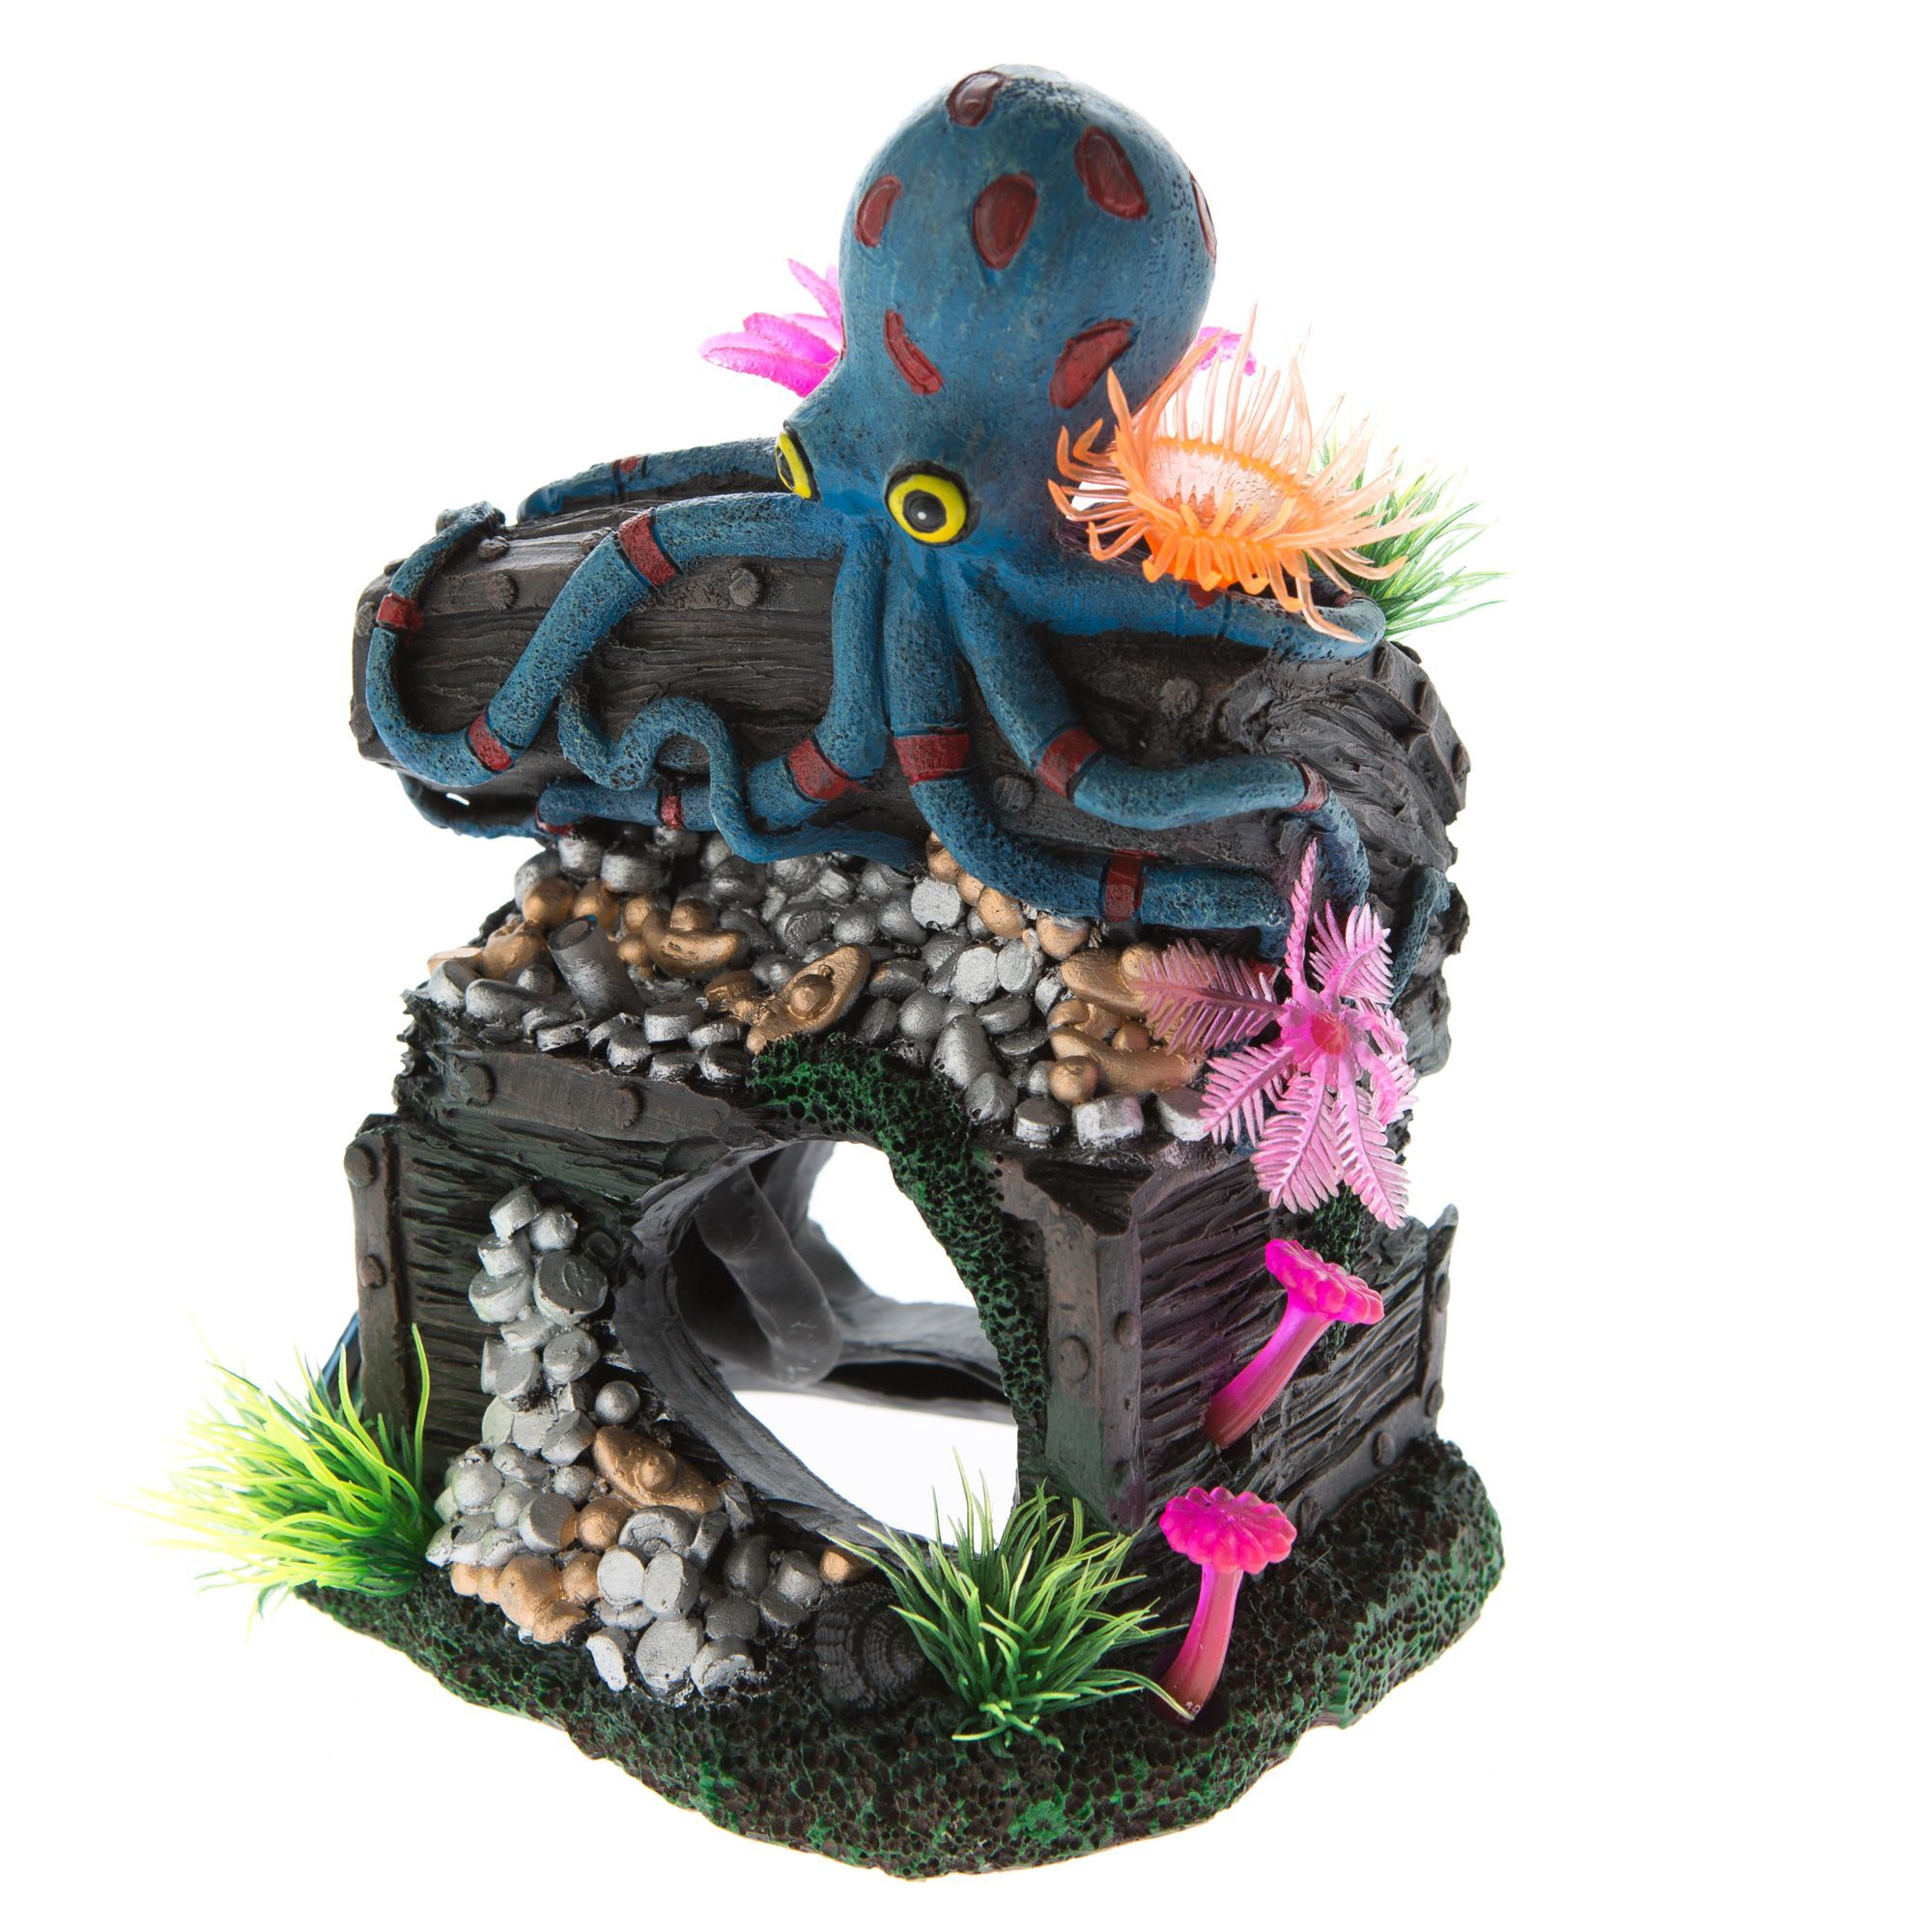 Top Fin Sunken Octopus with Treasure Aquarium Ornament